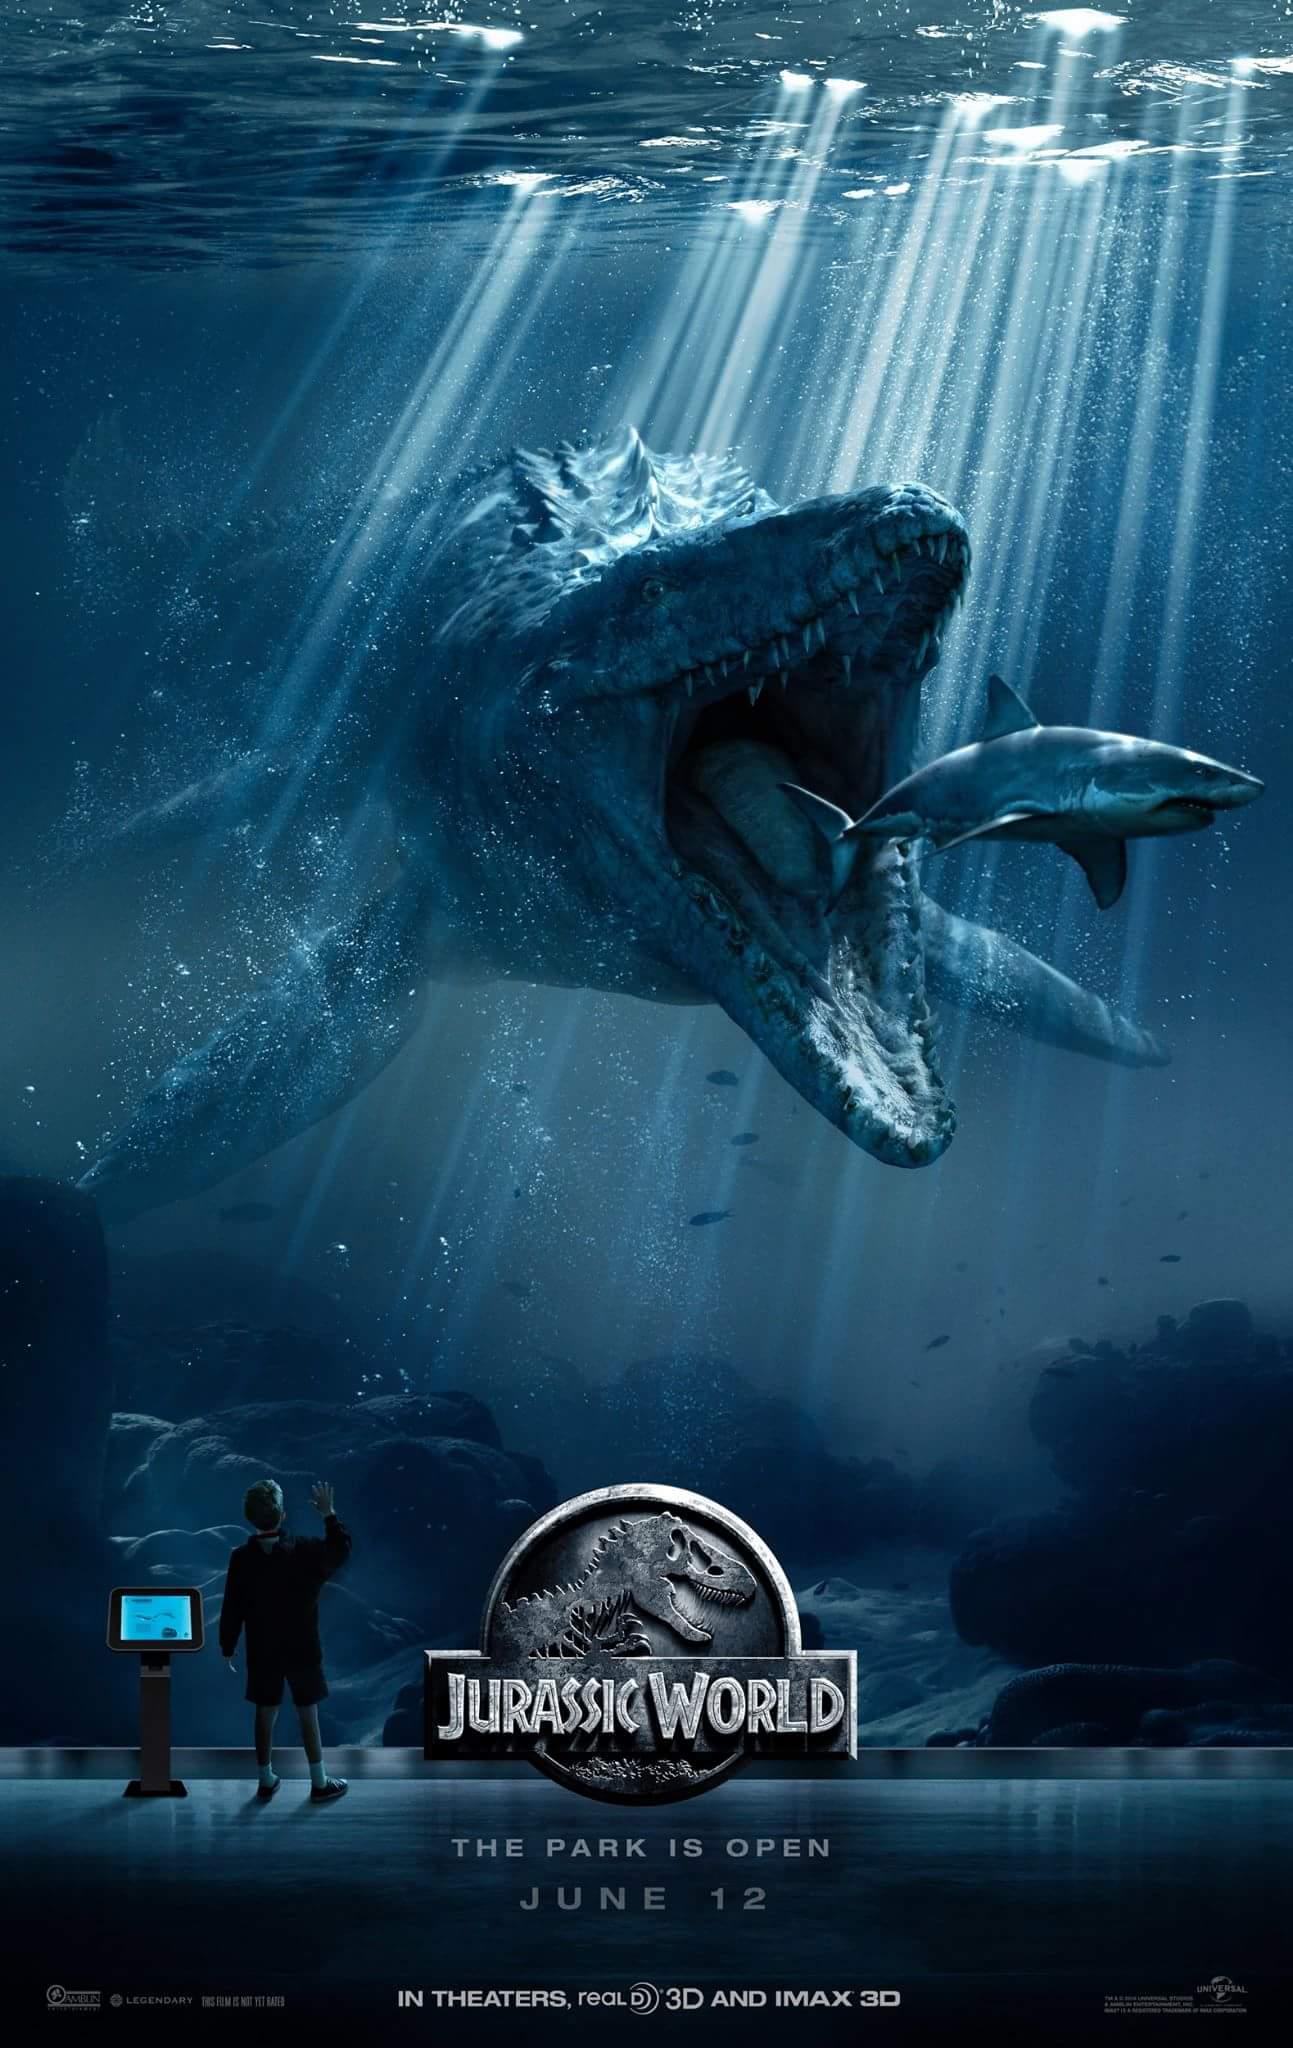 jurassic world mosasaurus poster